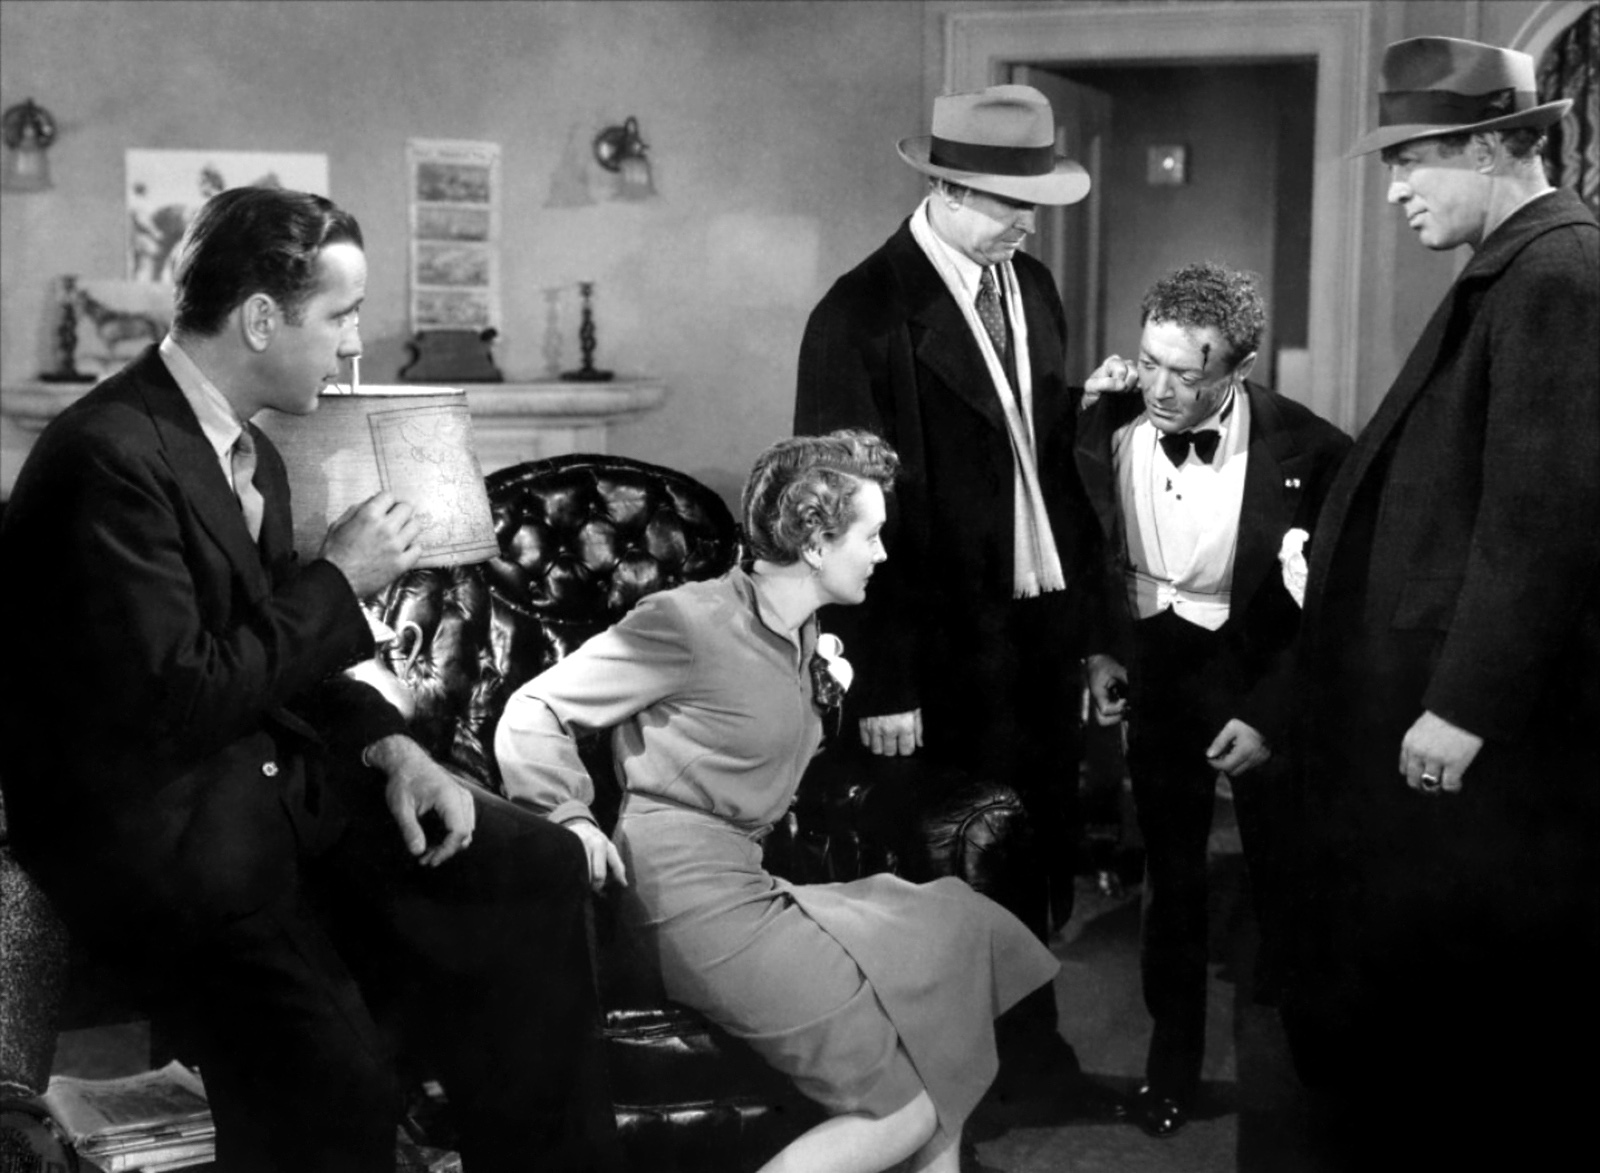 F20 «5 ένοχοι, 3 εγκλήματα» - «The Maltese Falcon»